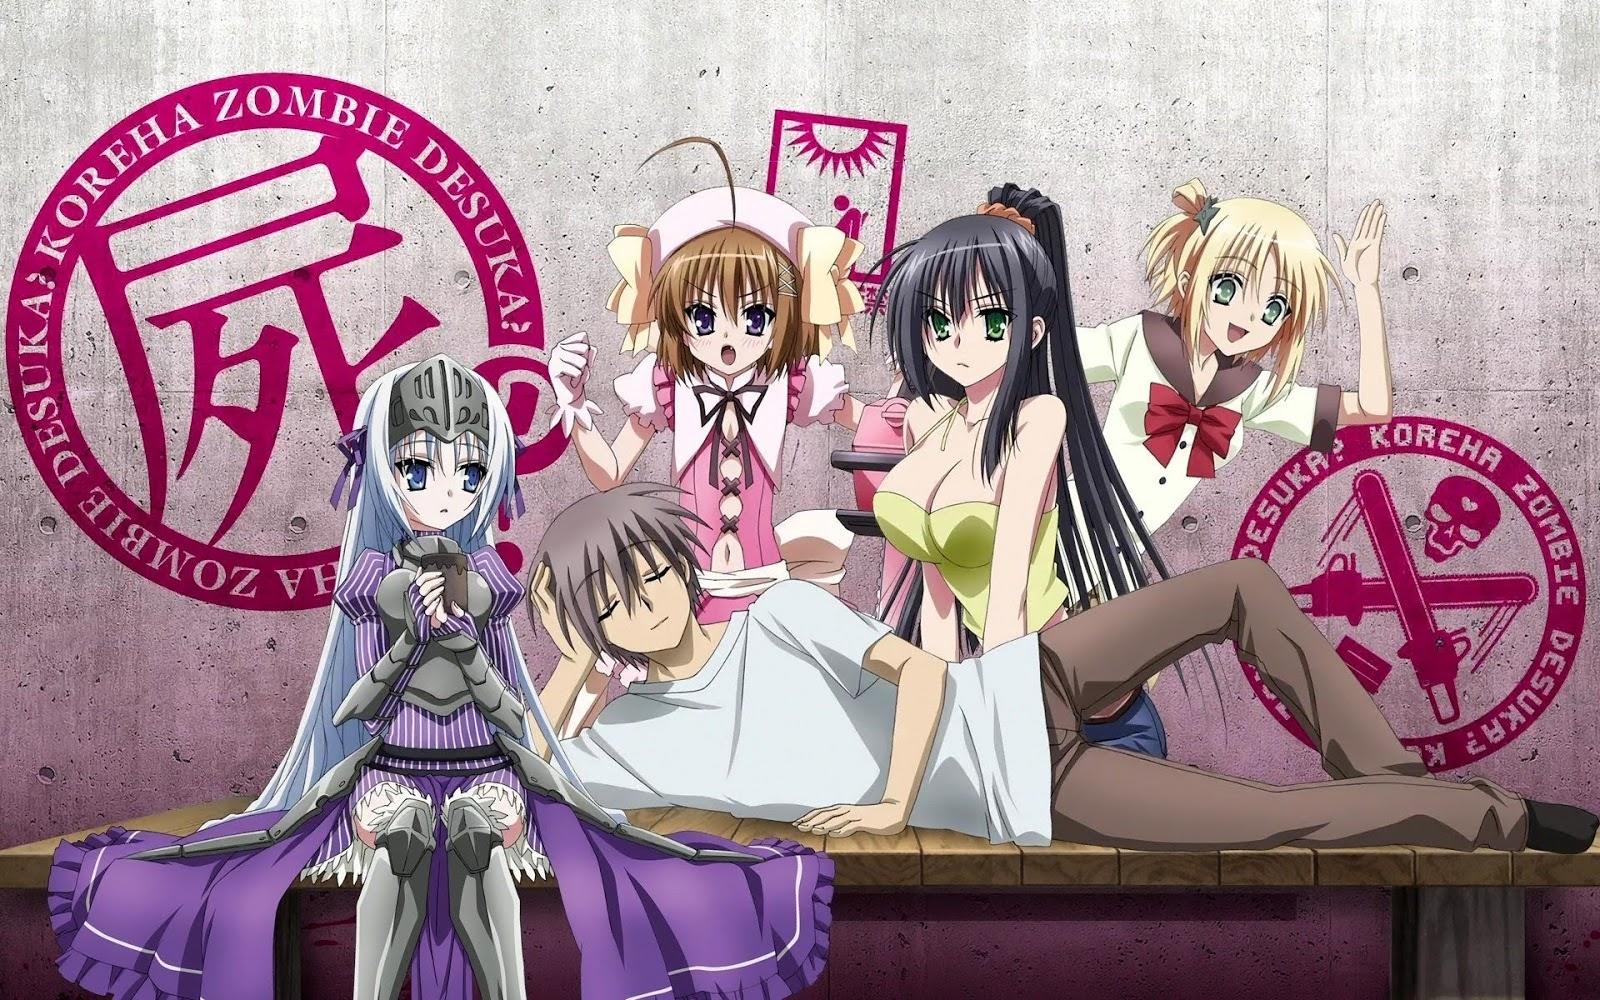 Download Kore Wa Zombie Desuka BD OVA Subtitle IndonesiaTamat